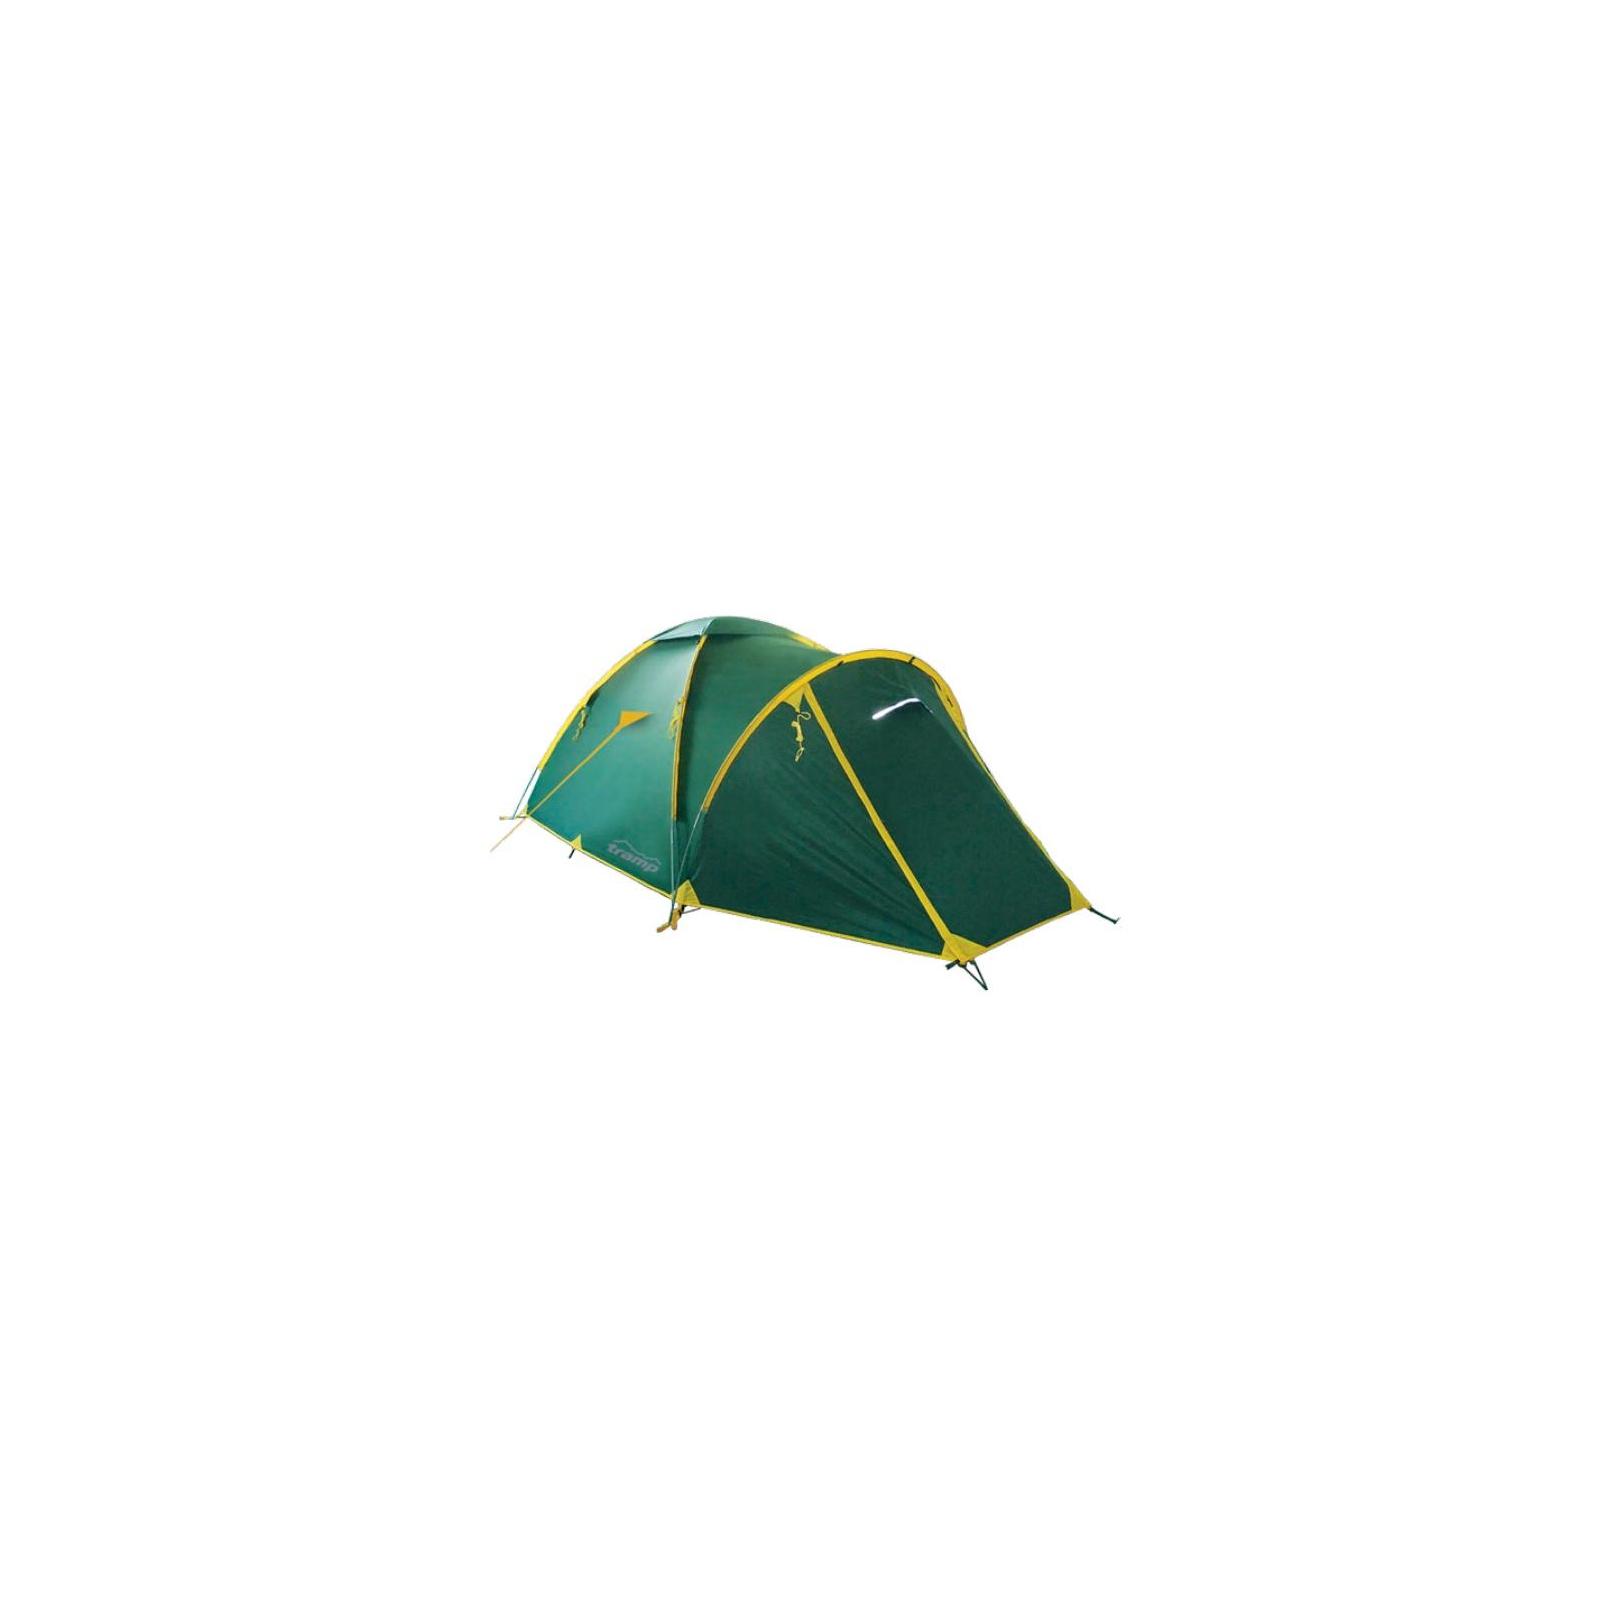 Палатка Tramp SPACE 3 v2 (TRT-059)